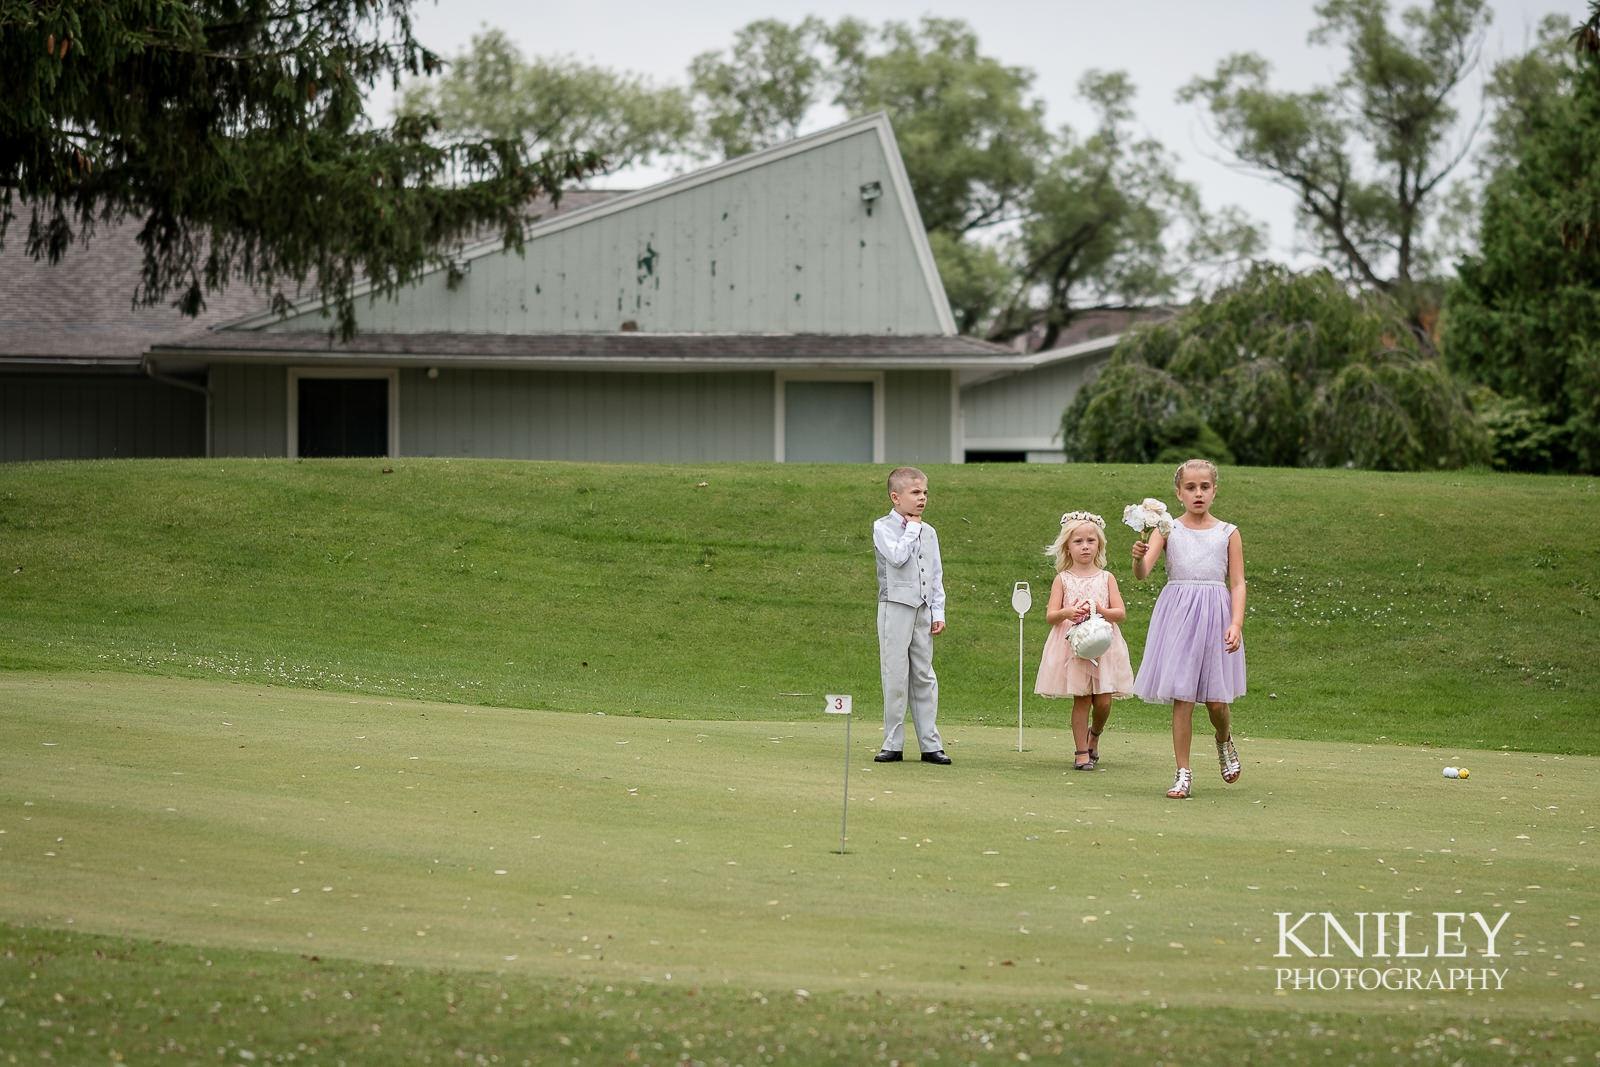 033 - Ontario Golf Club Wedding Pictures - XT2A6578.jpg